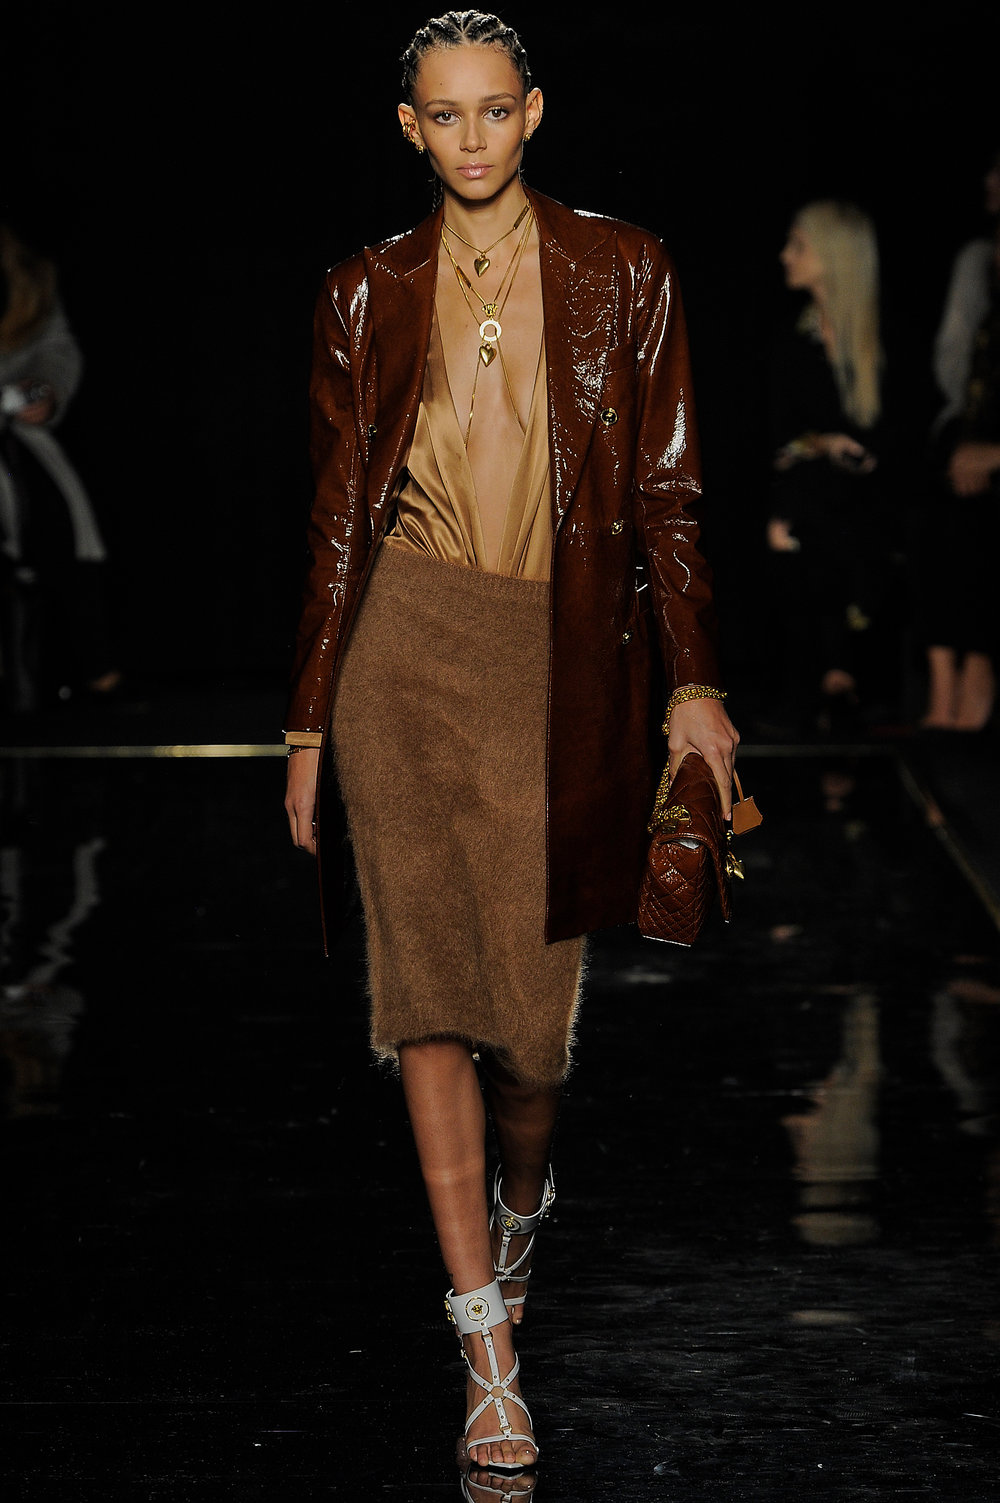 Versace_2_fd_versace_runway_runway_00002.jpg